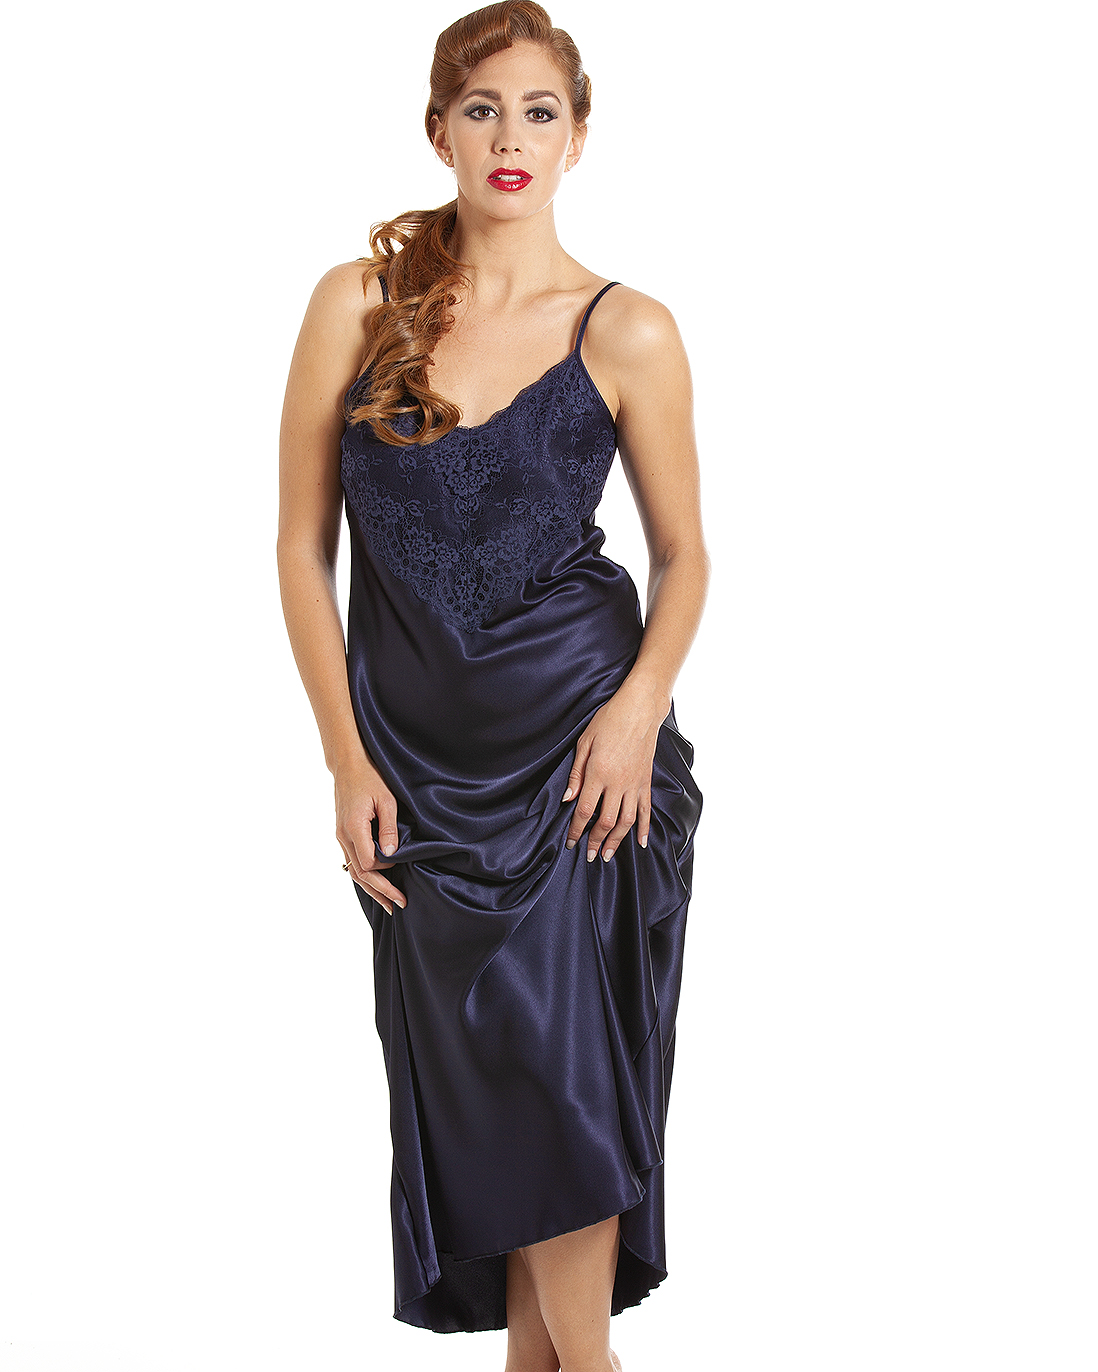 c4814be4e077 Jane Lace Trim Satin Long Nightdress – Night Mist Blue